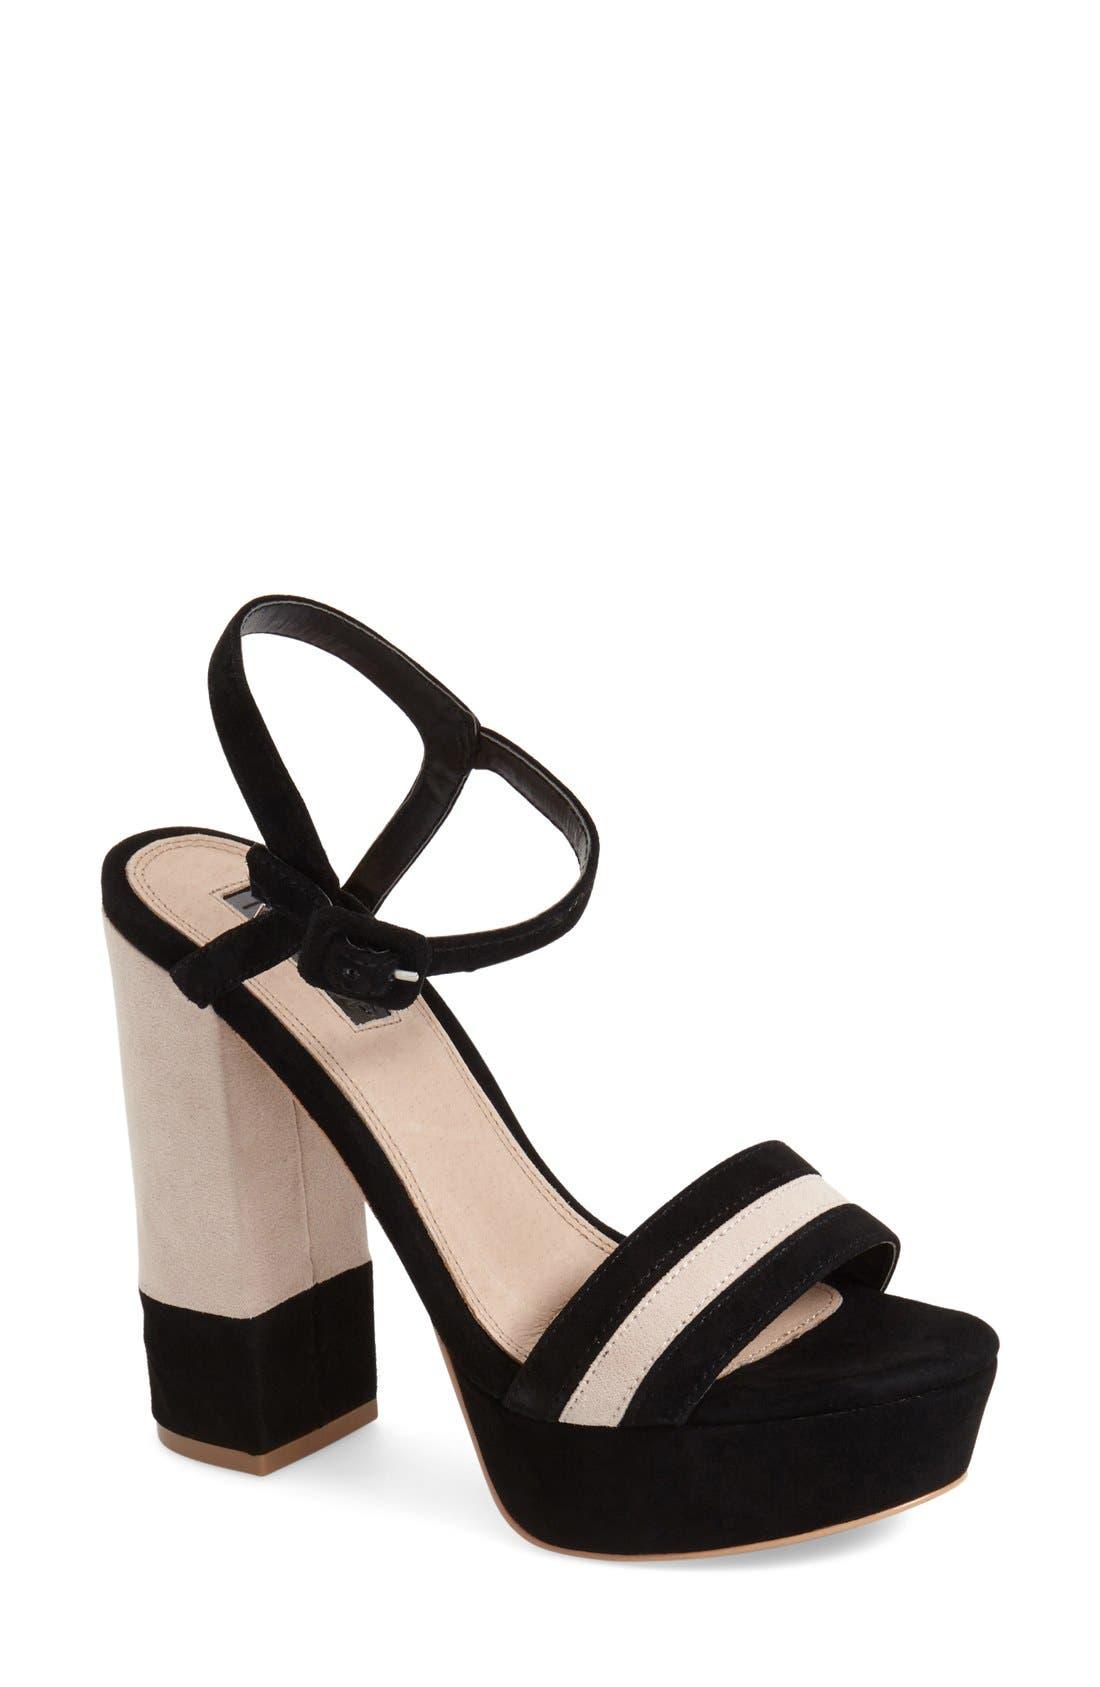 Main Image - Topshop 'Laker' Platform Sandal (Women)